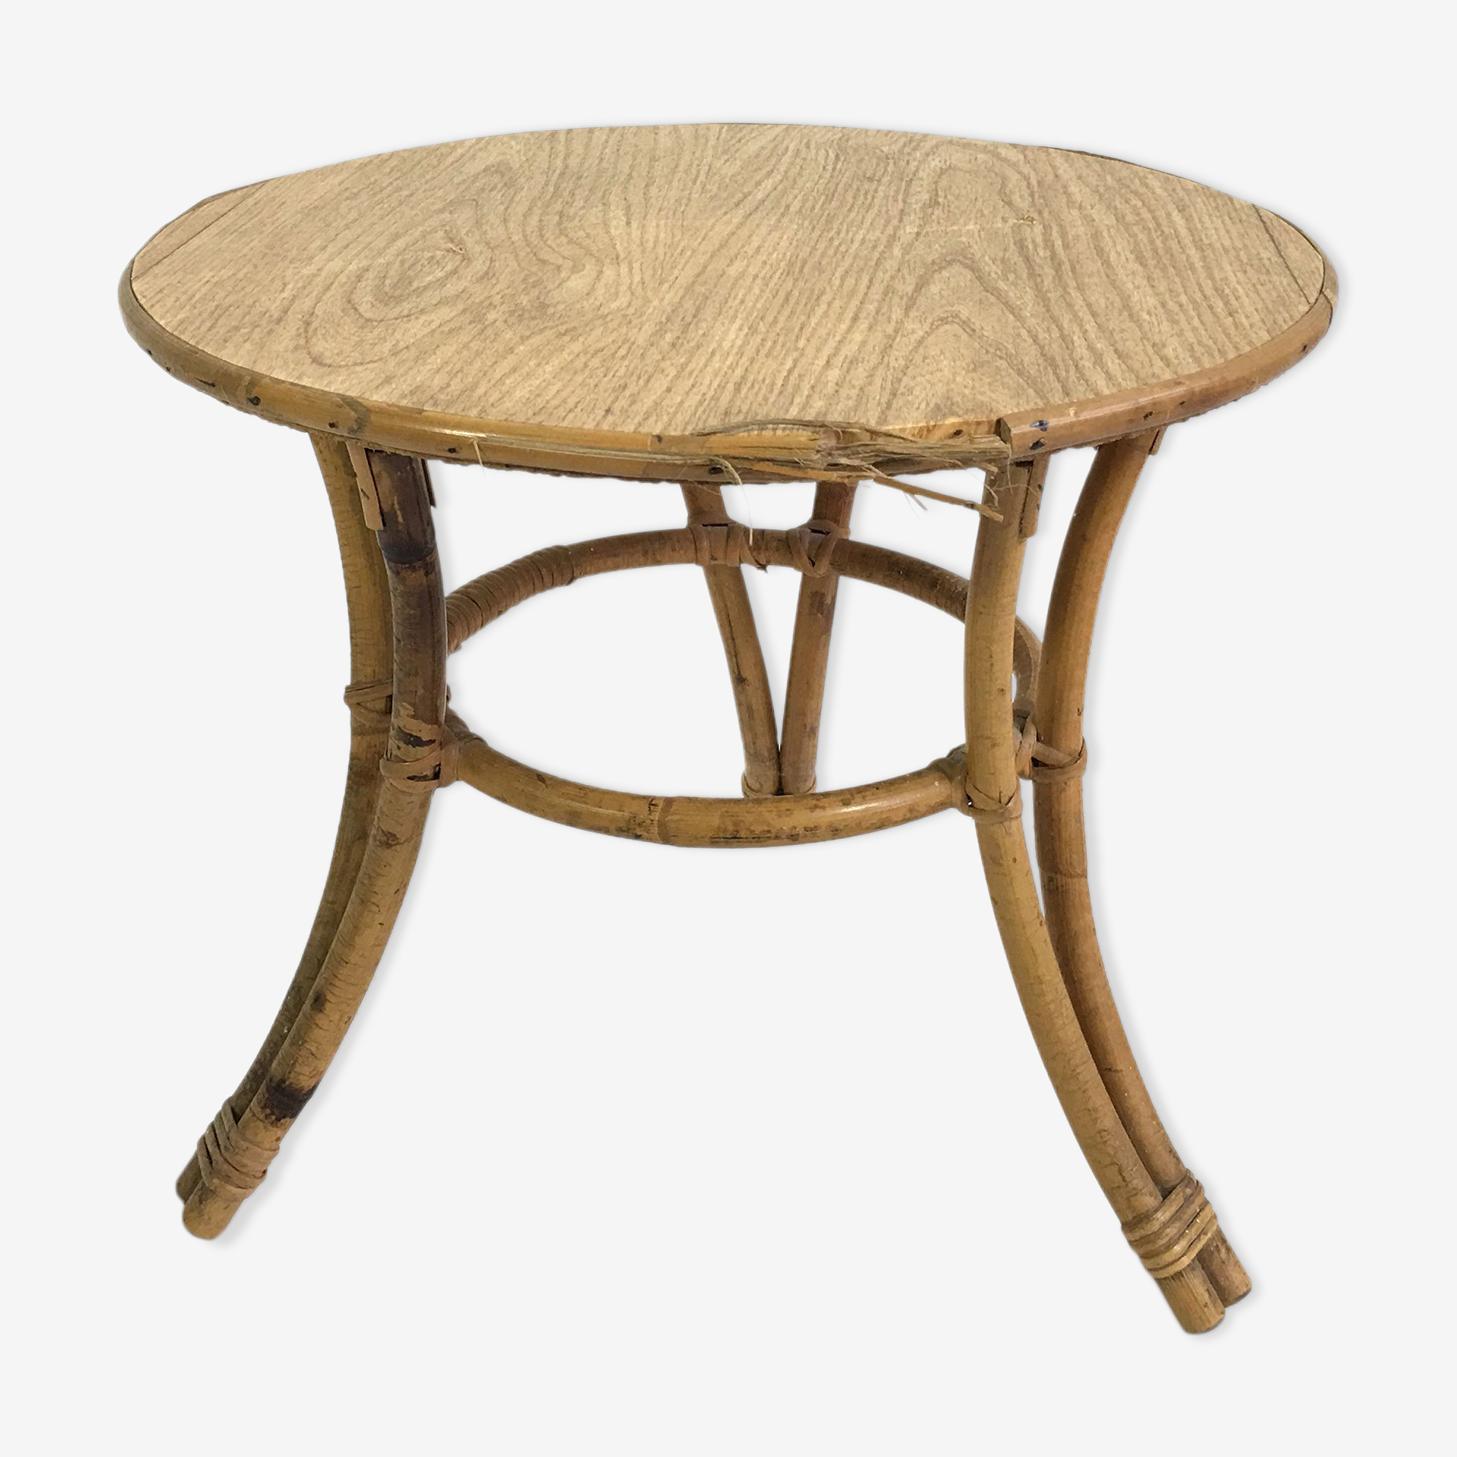 Table basse en bambou et rotin, France, 1960